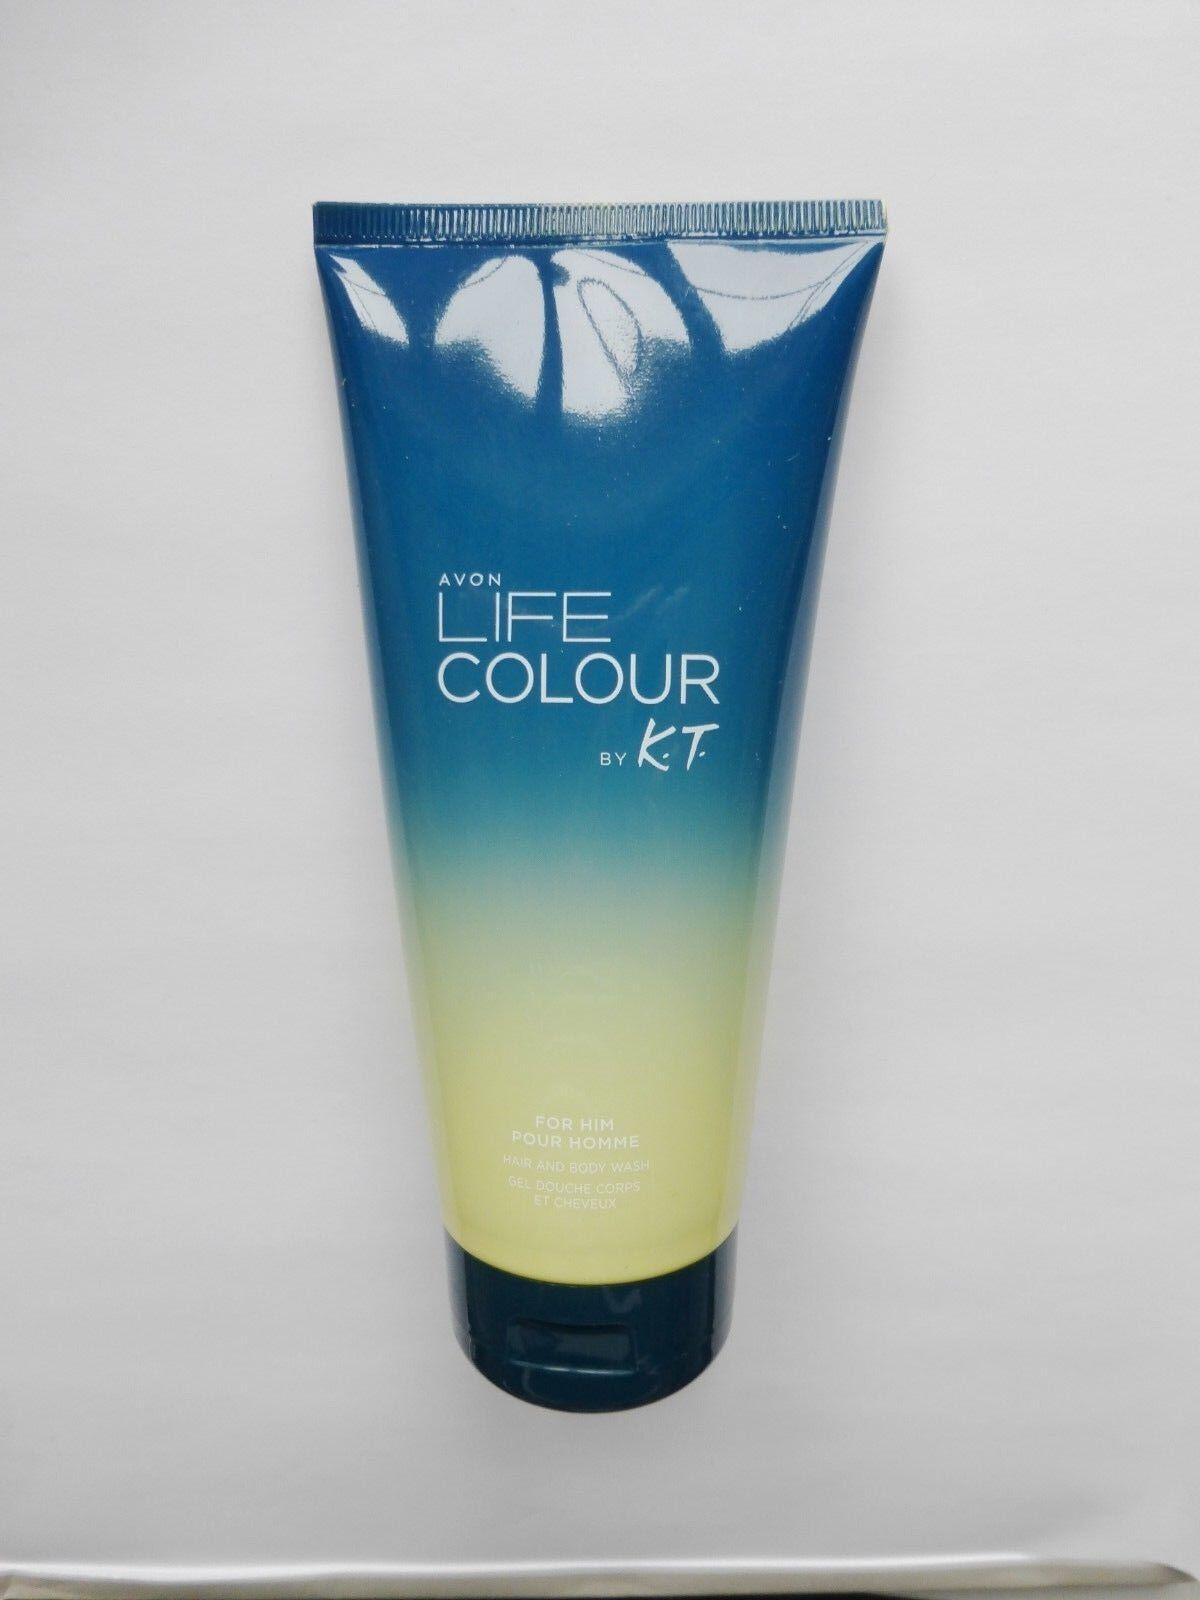 (100ml/1,50€) Avon Life Colour Für Ihn by Kenzo Takada Shampoo & Duschgel